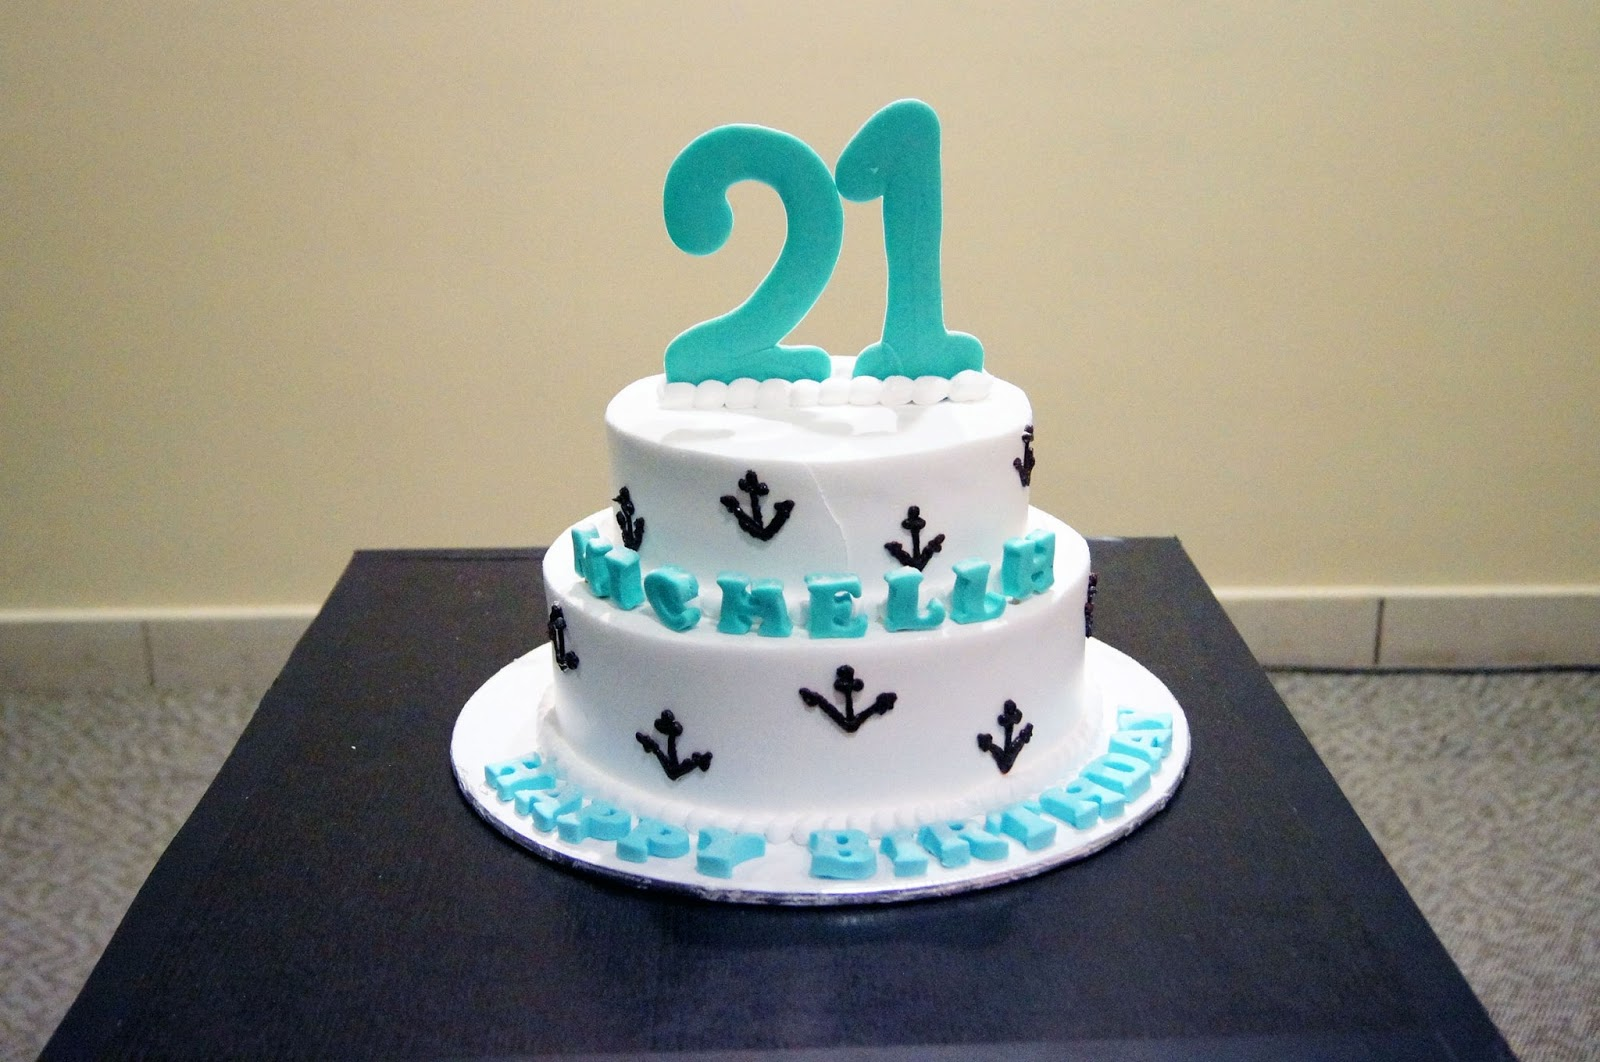 Garden Design Birthday Cake mama mira tale of 2 cakes. cake for first birthday singapore best